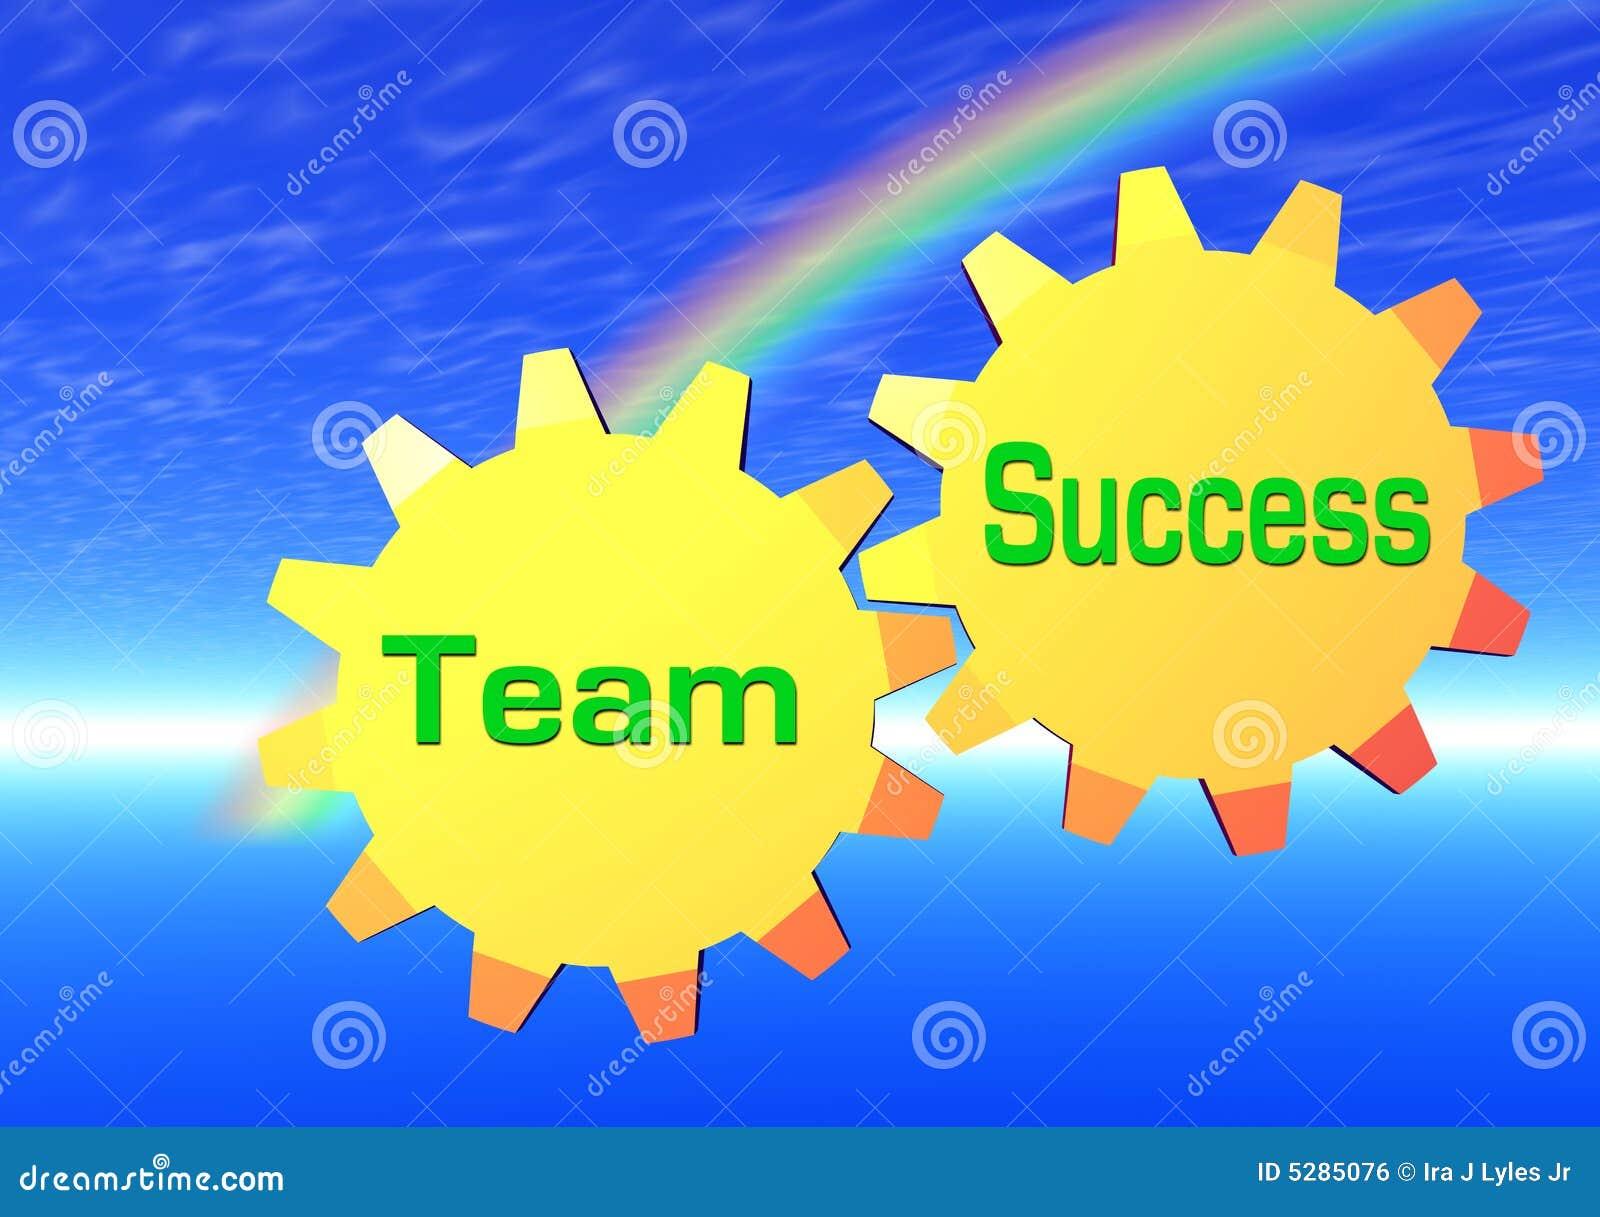 Team Success Royalty Free Stock Image Image 5285076